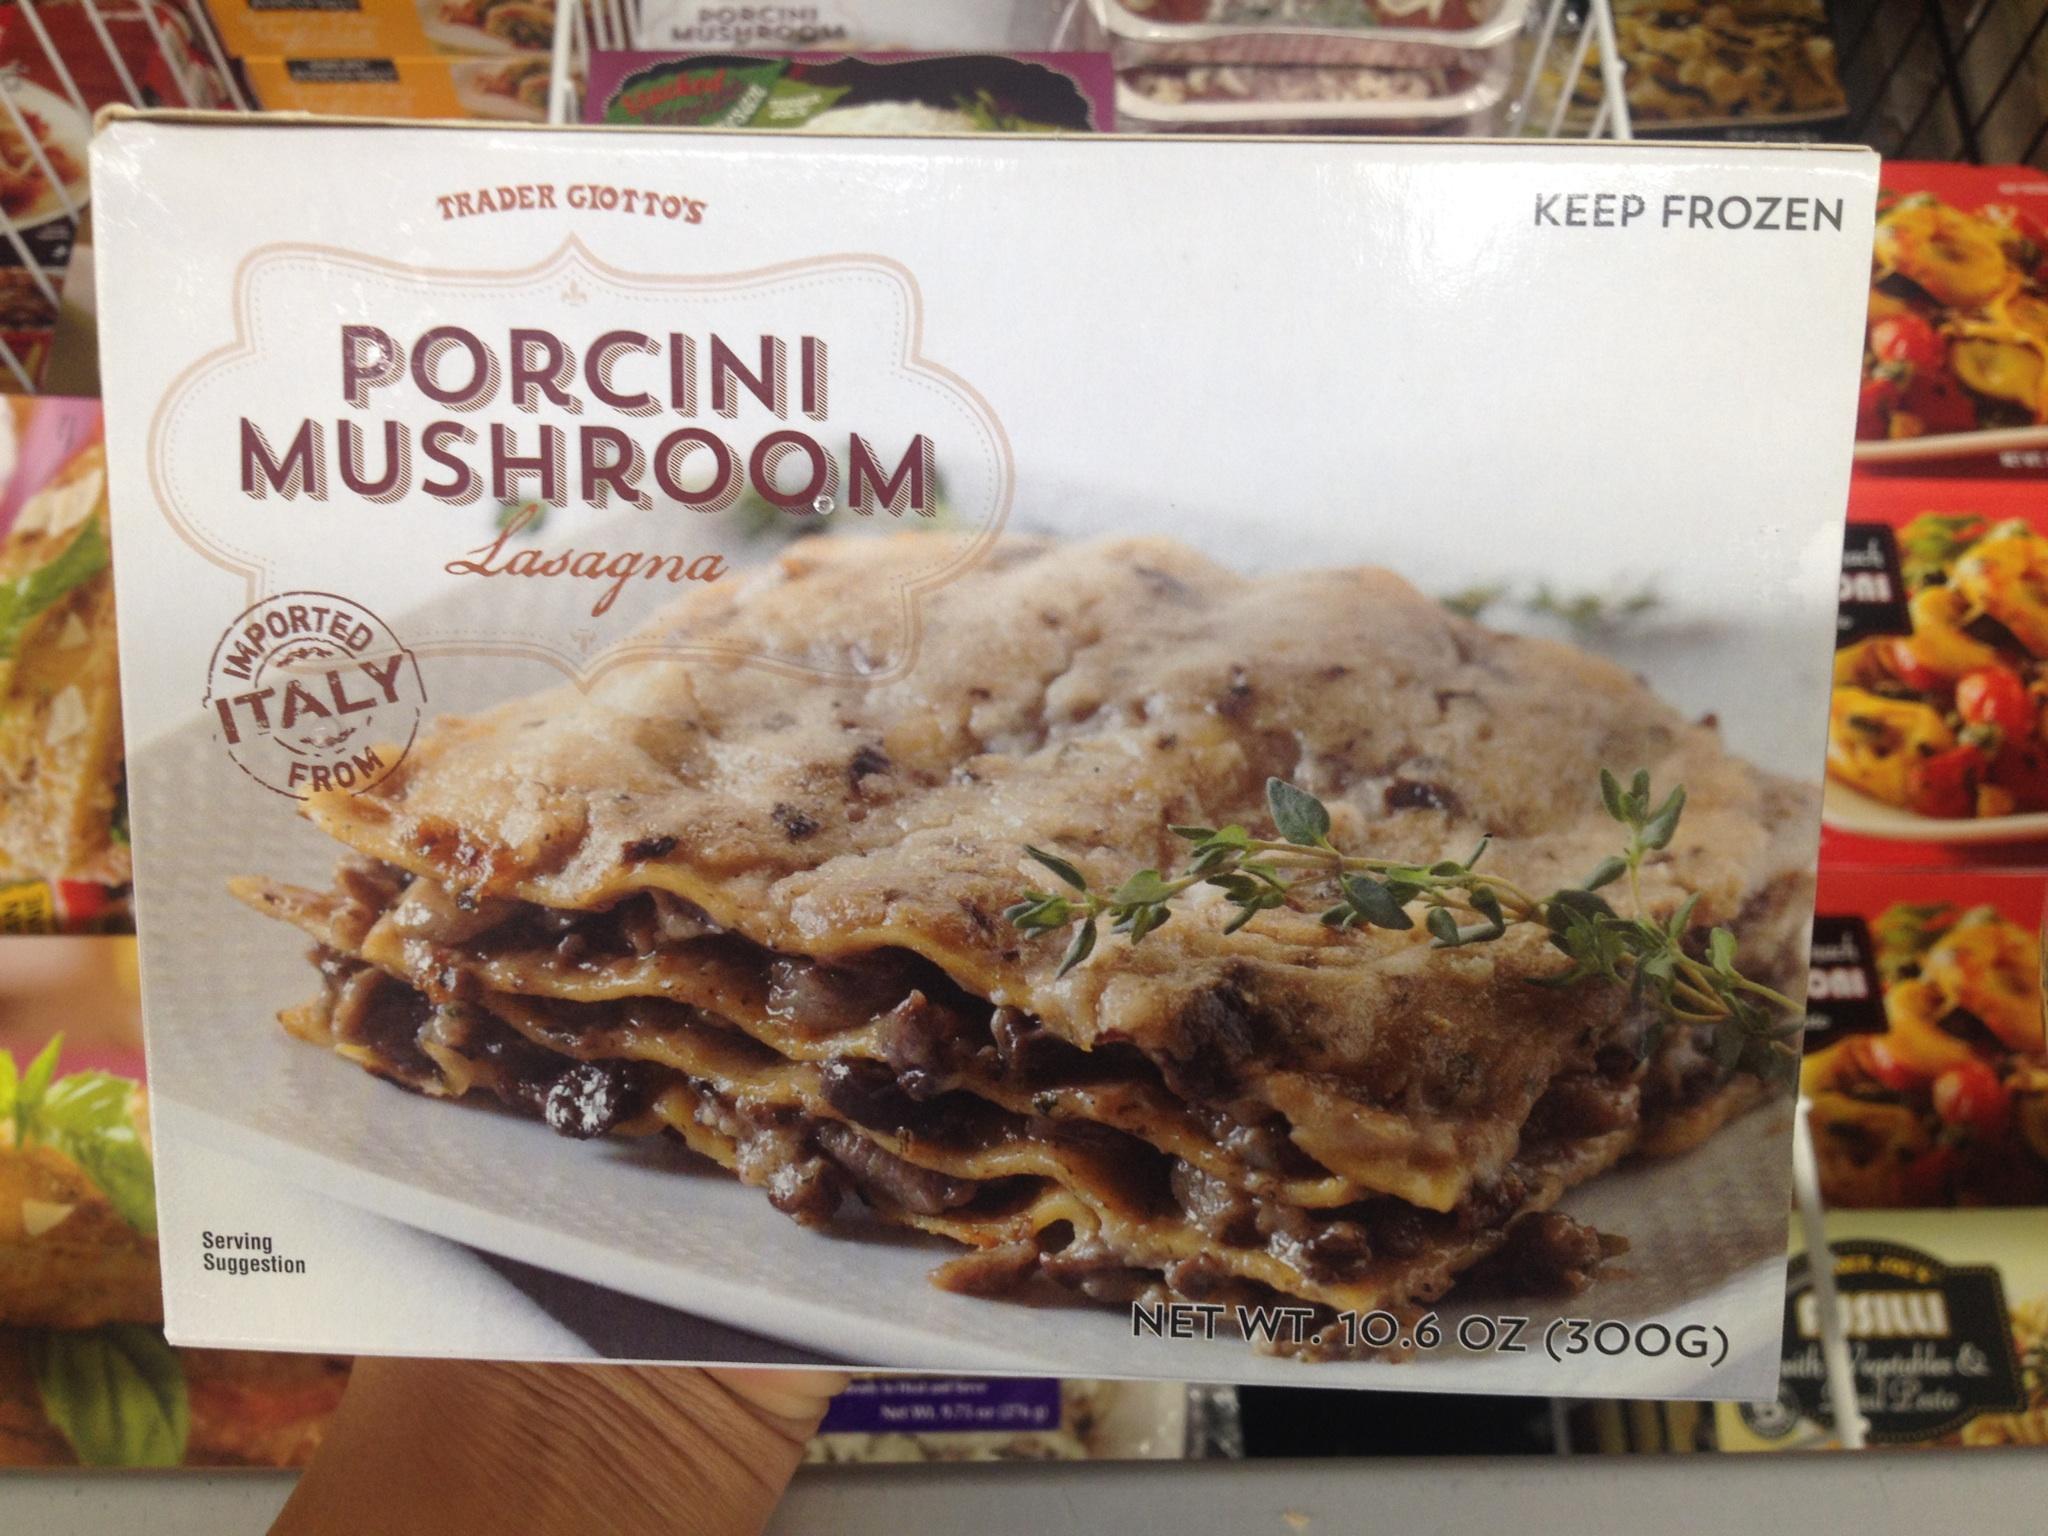 Dried Porcini Mushrooms Trader Joe'S  Trader Joe's Porcini Mushroom Lasagna – The Trader Joes